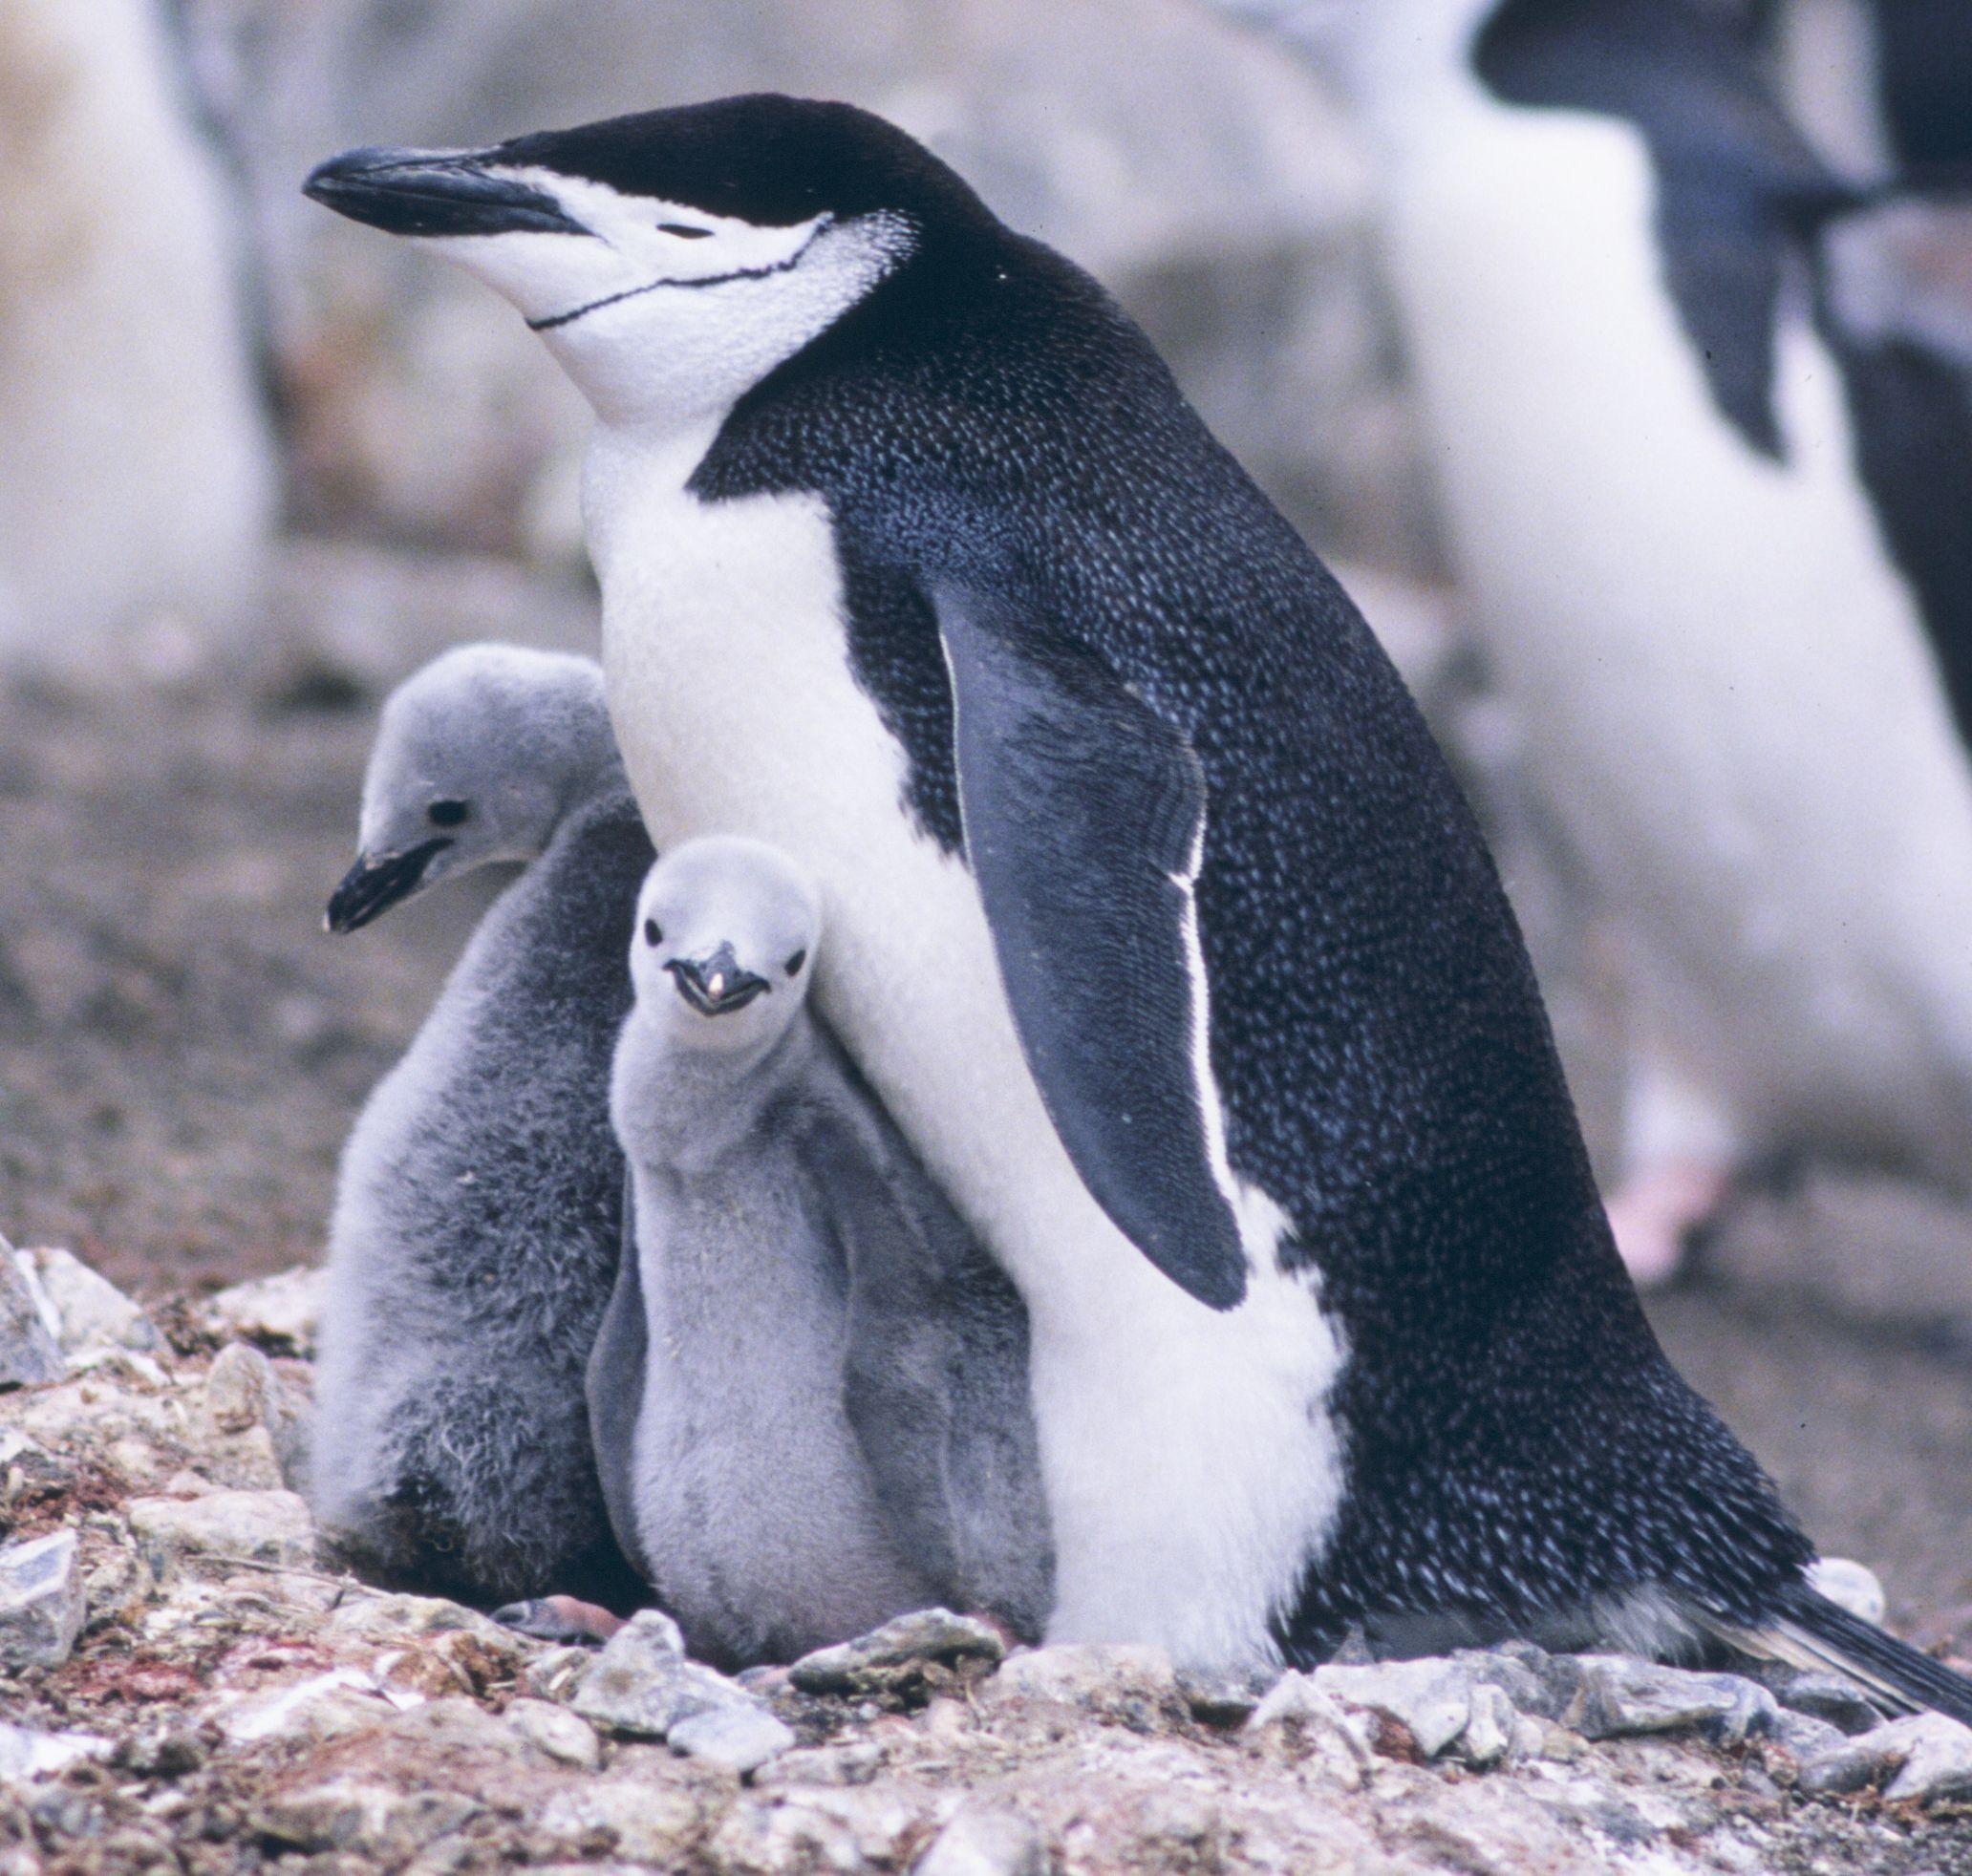 It S World Penguin Day Here Are Some Ways To Celebrate Especies De Pinguinos Especies En Peligro De Extinción Spheniscidae